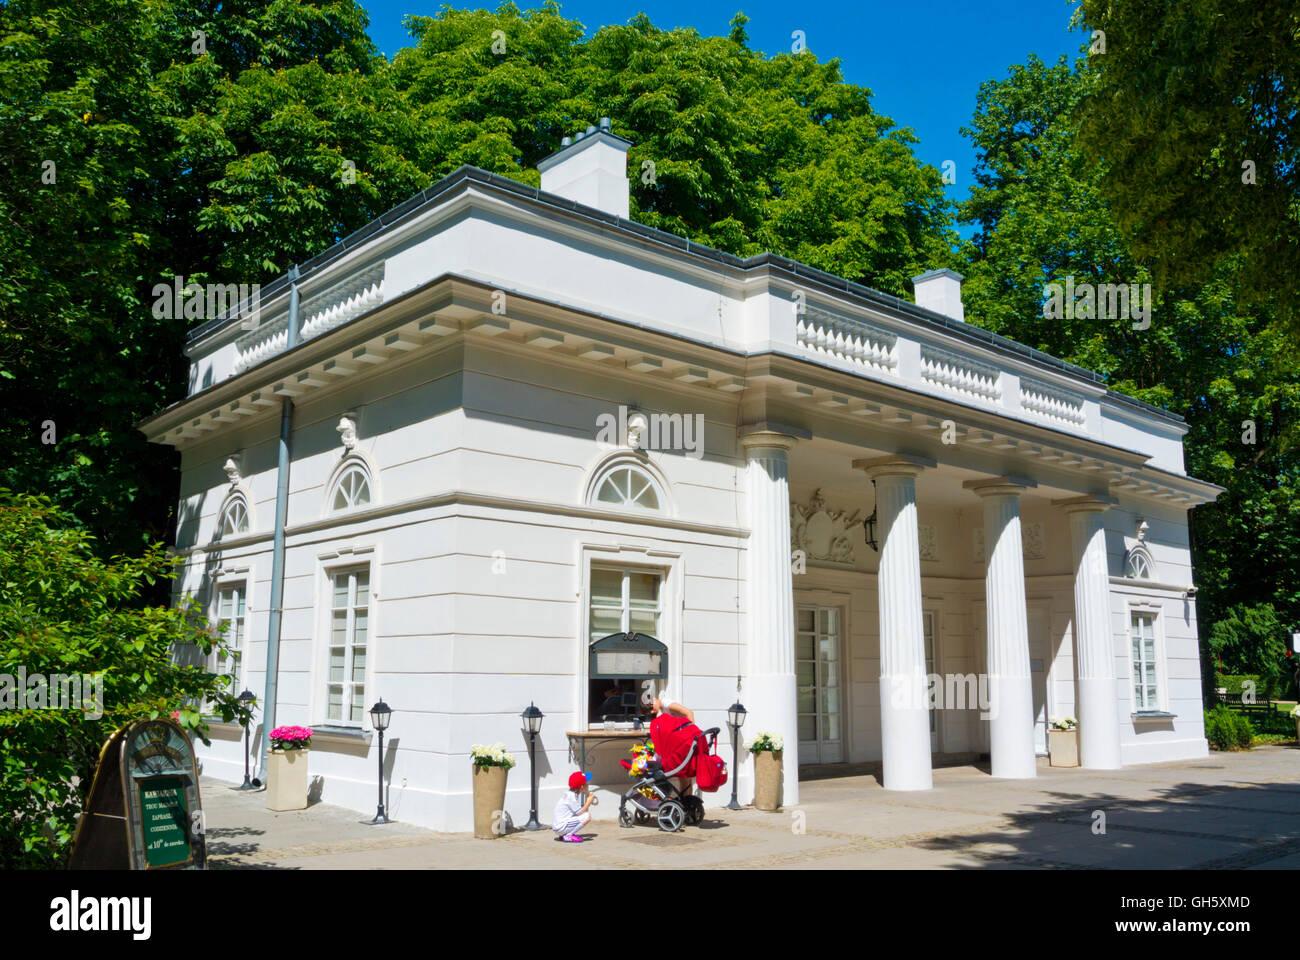 Nowa Kordegarda Building Housing Trou Madame Cafe Lazienki